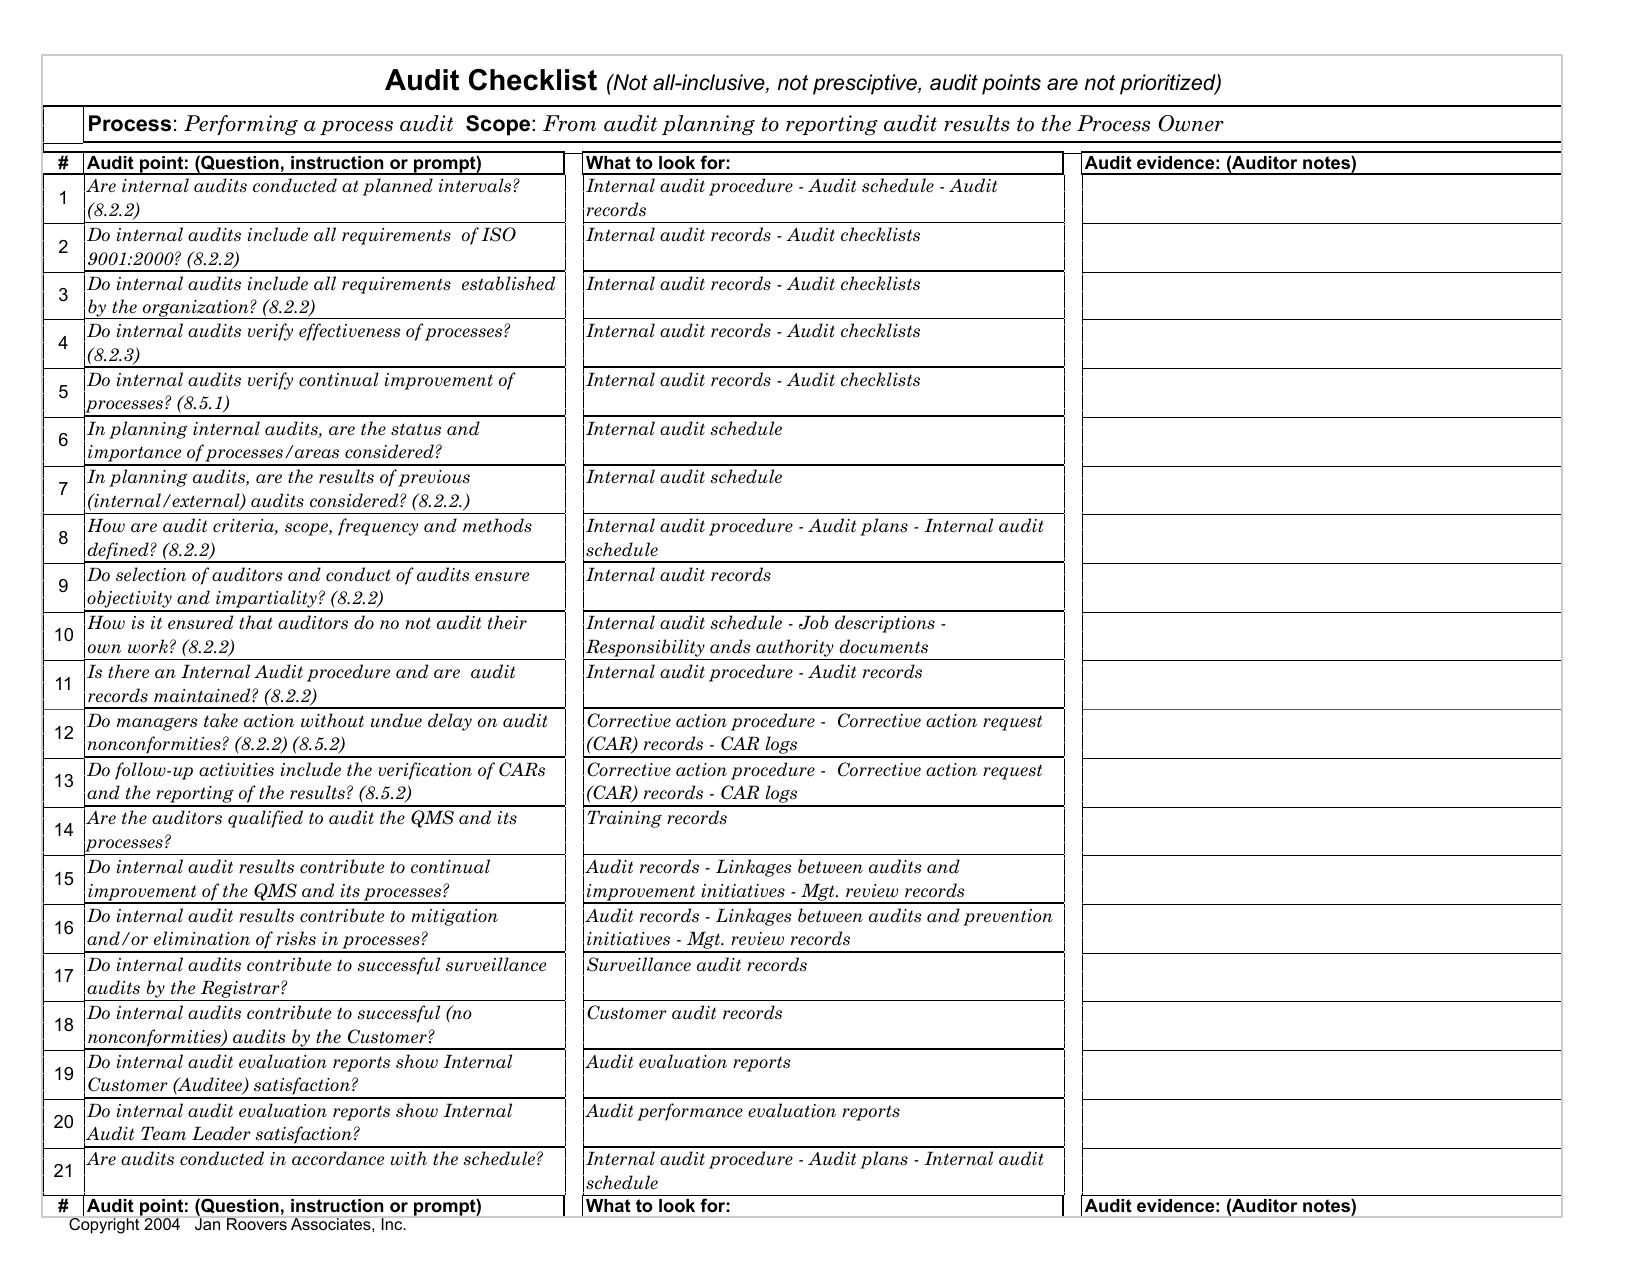 Letter Of Internal Audit Checklist Template Excel Inside Internal Audit Checklist Template Excel Template